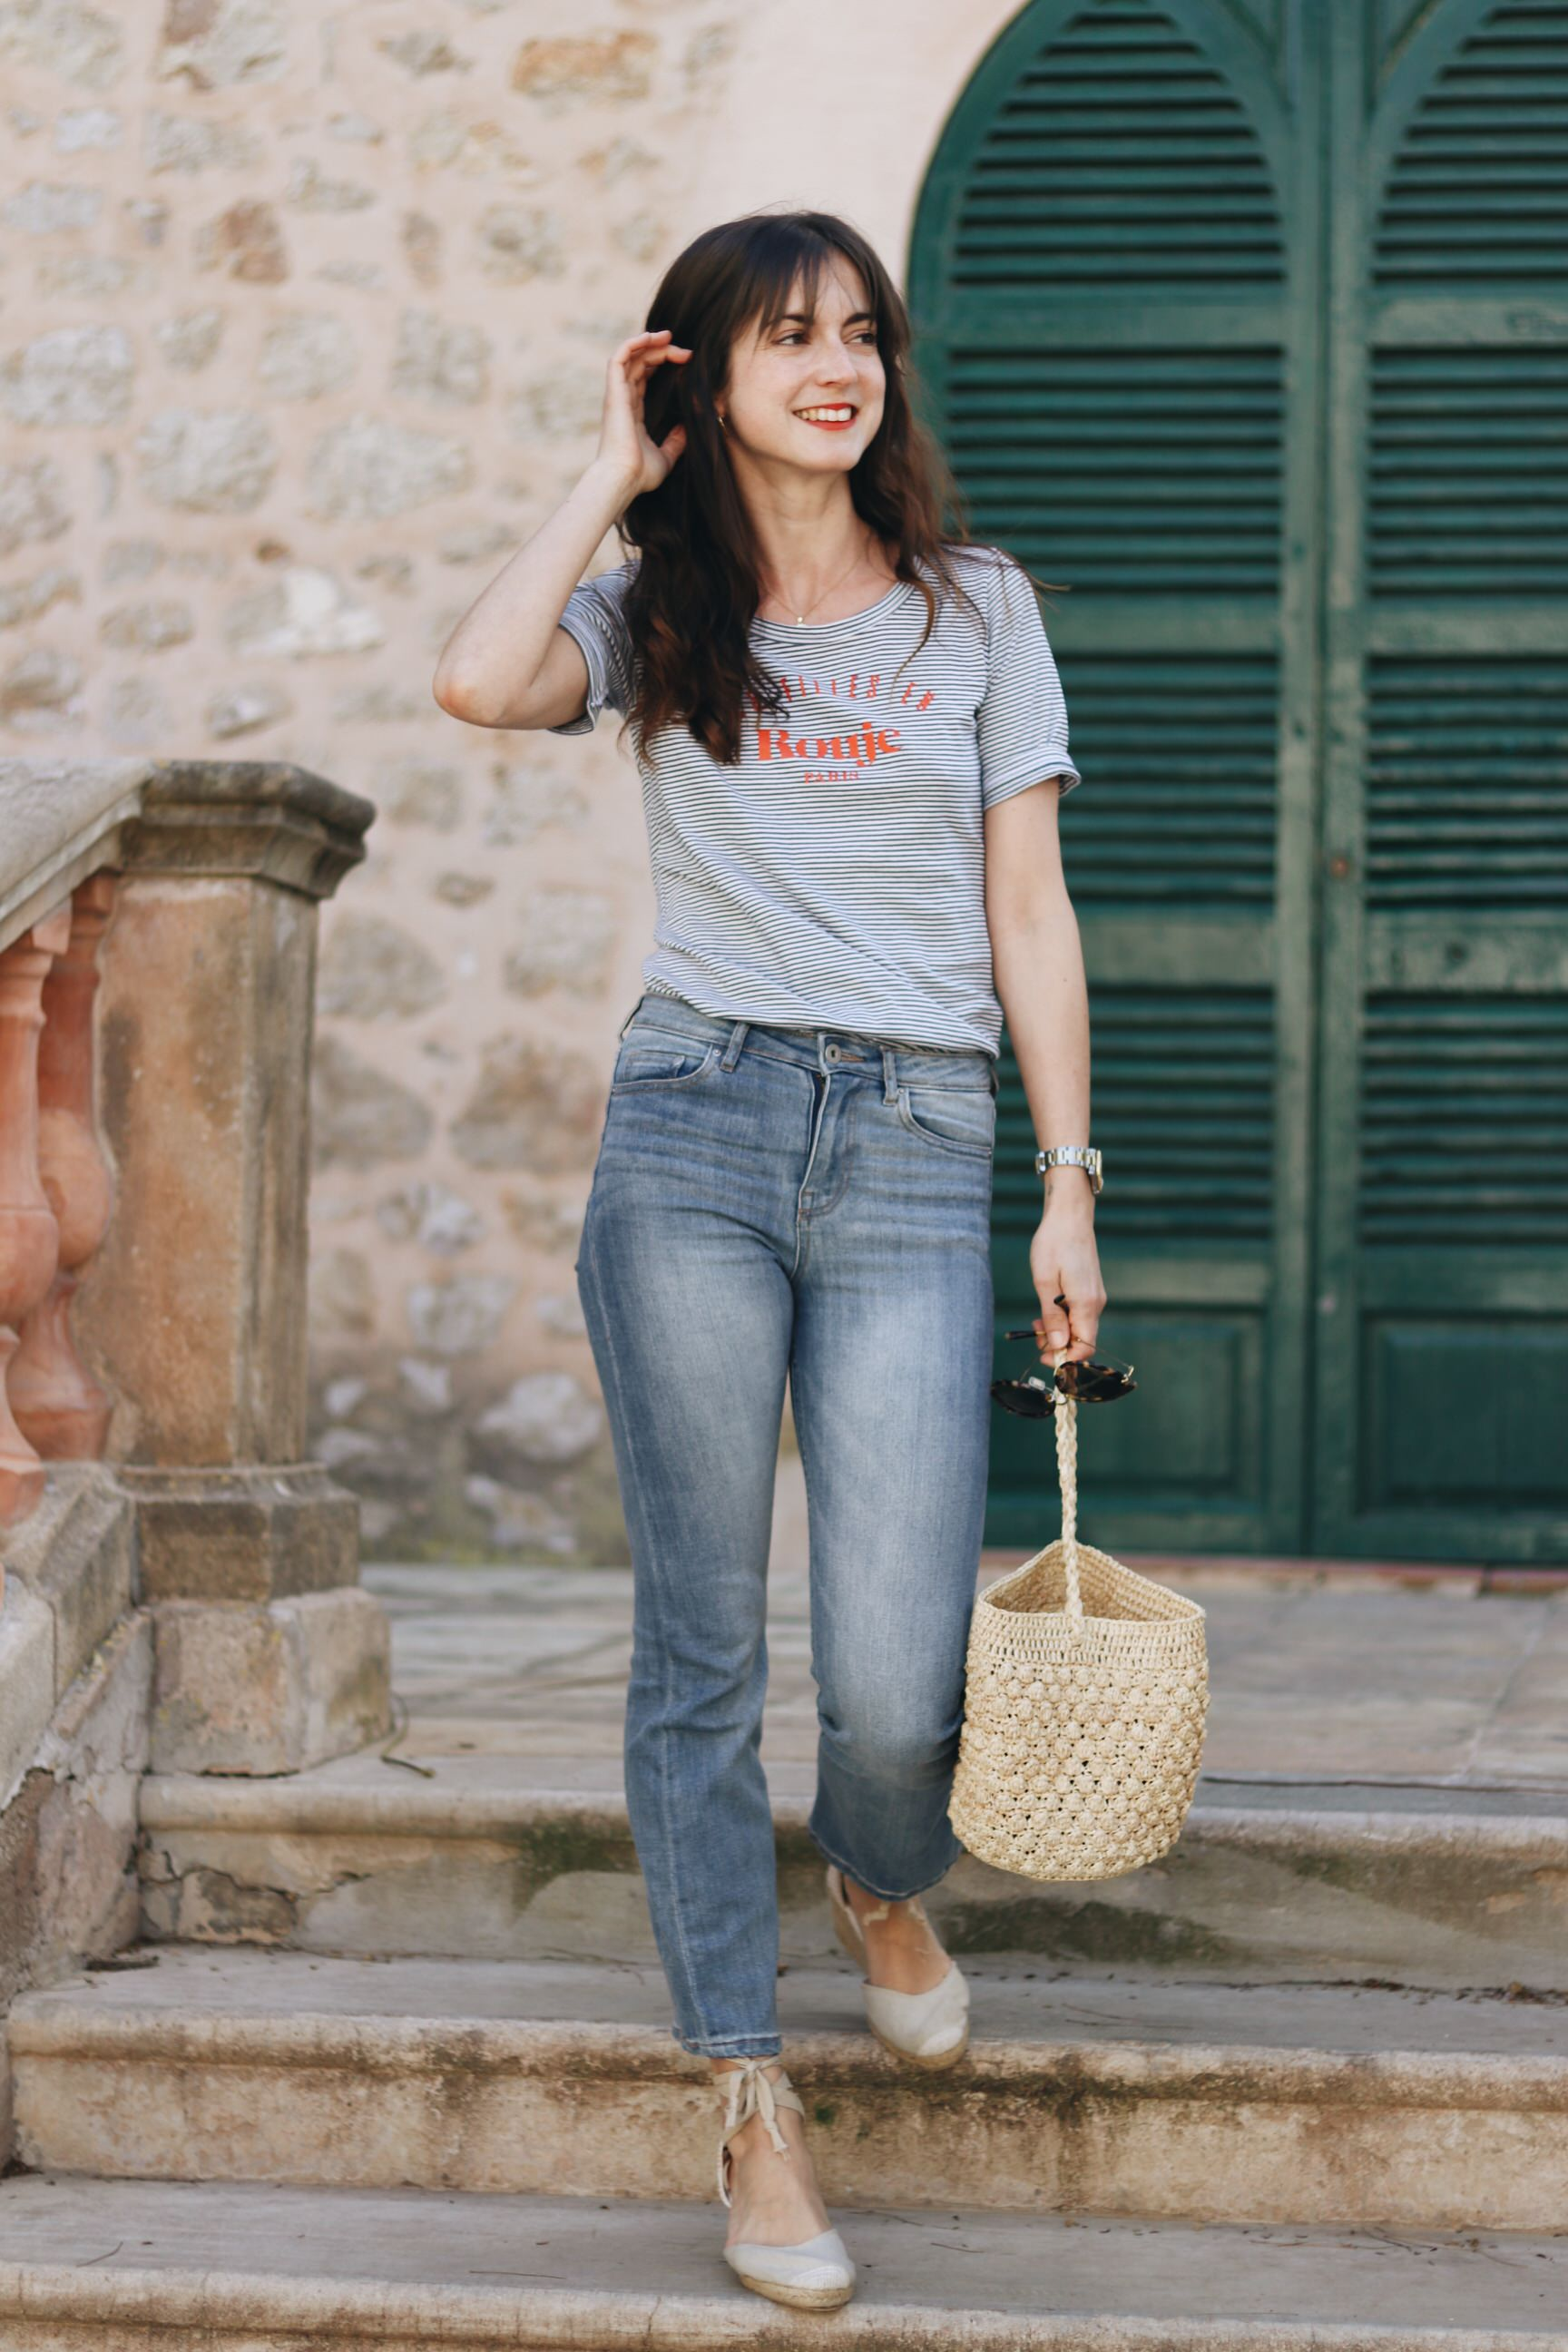 Fruehlings Outfit Blog Modeblog Streifen Kick Flare Jeans espadrilles Schuhe Fruehling Look